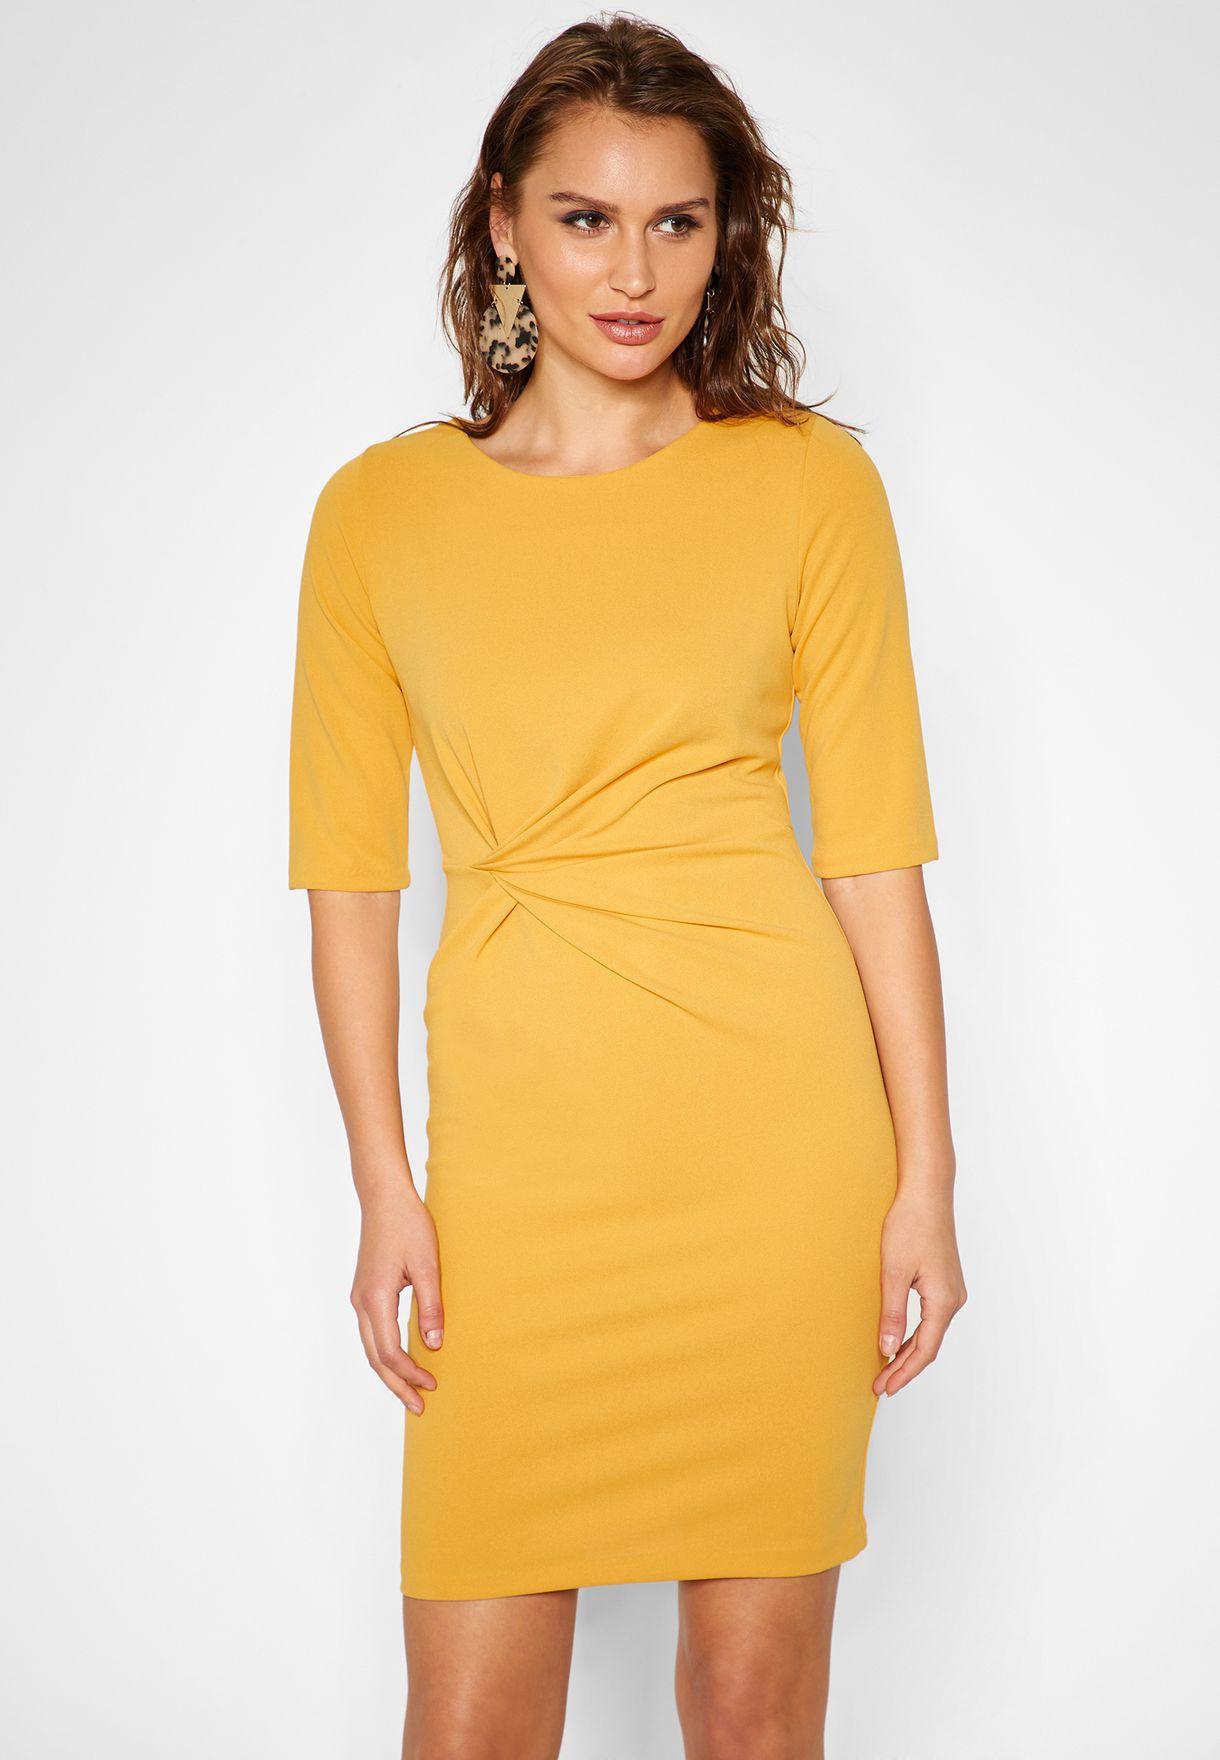 Ruched Detail Mini Dress